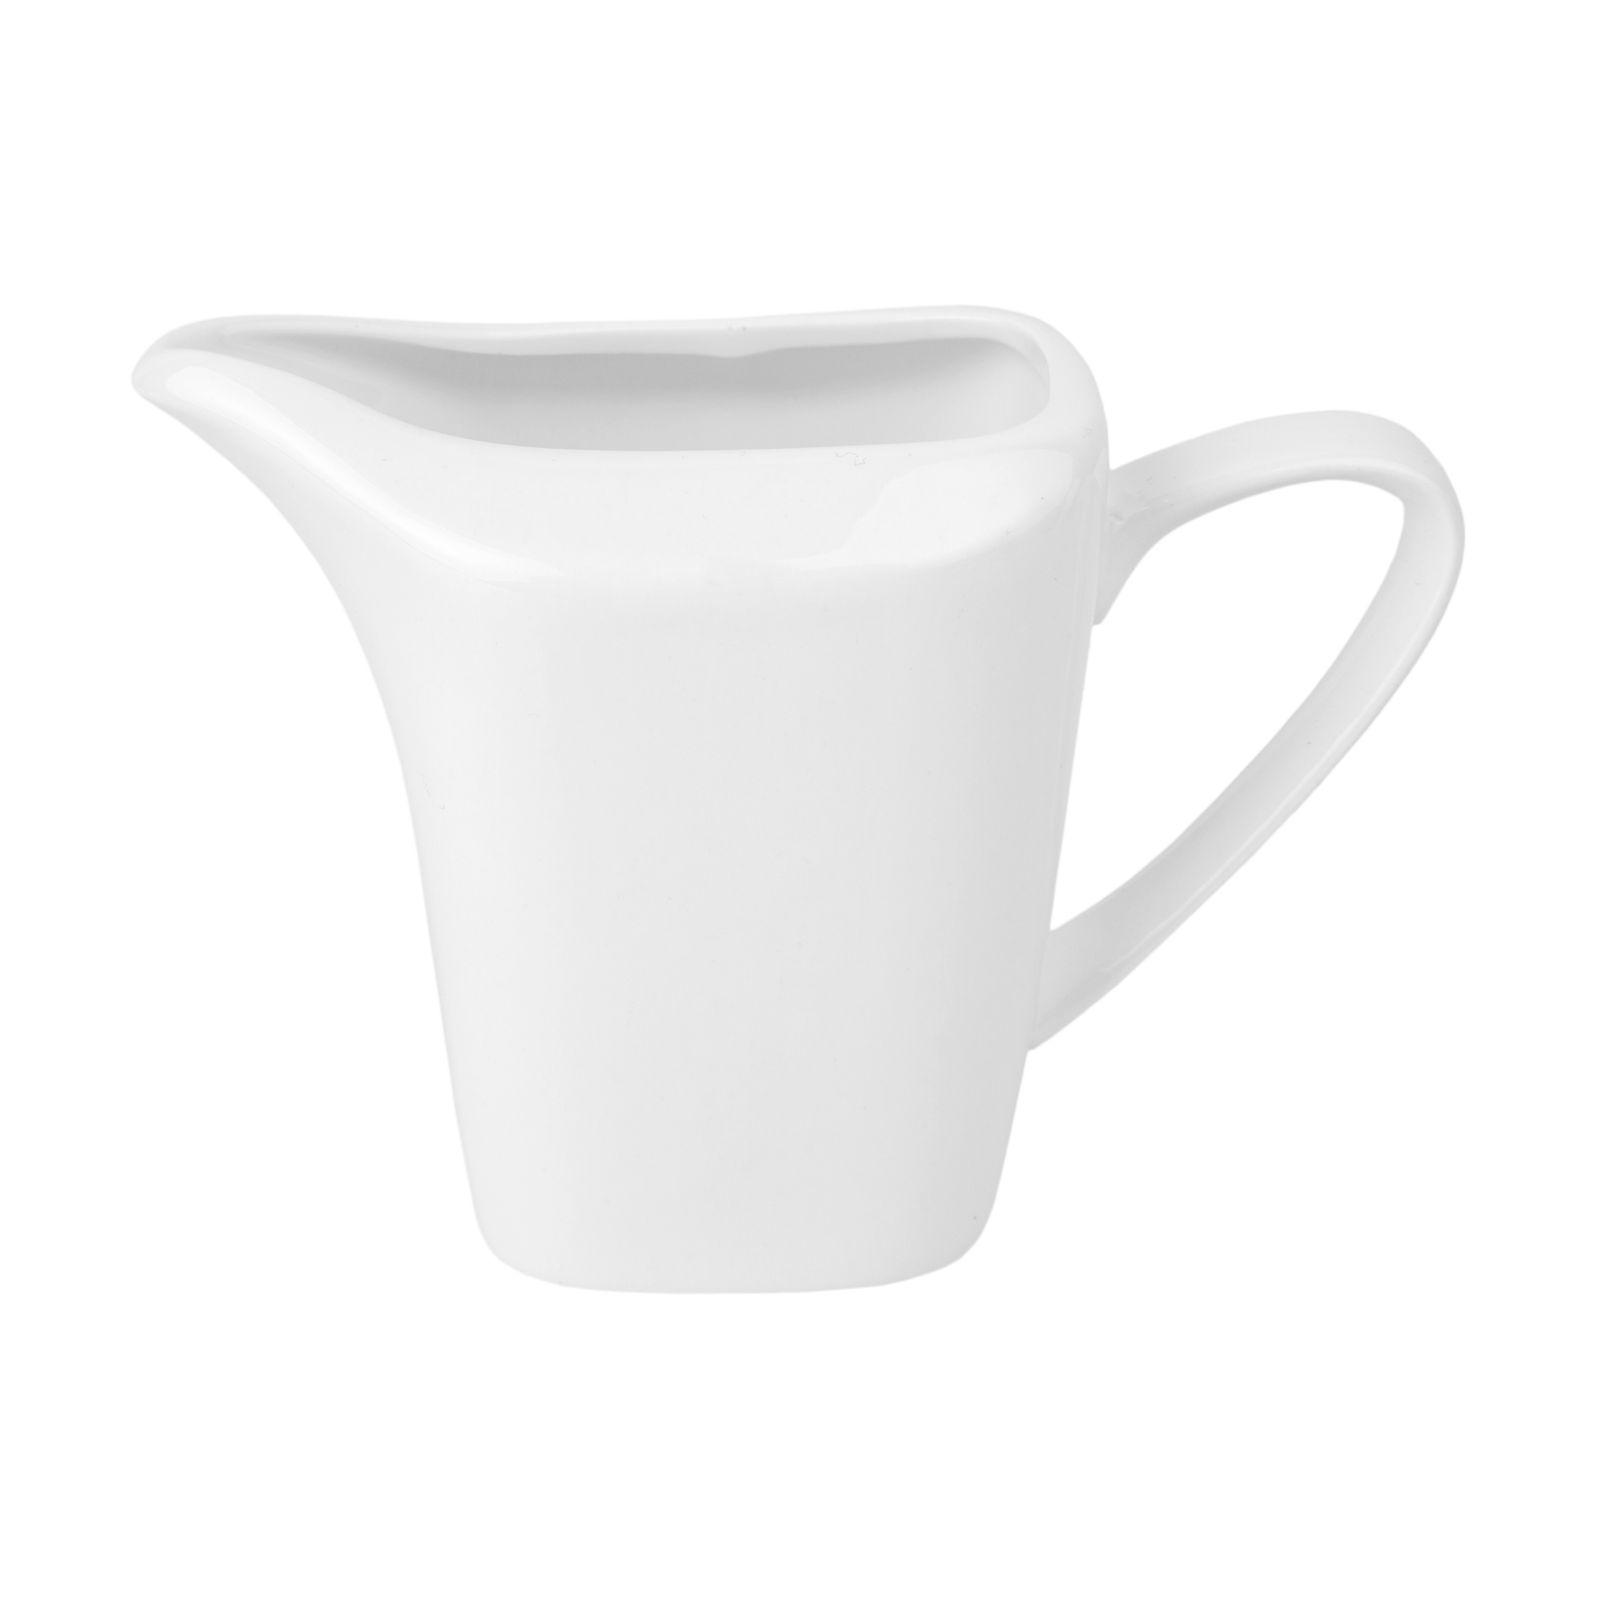 Milk jug 220 ml Tokyo AMBITION